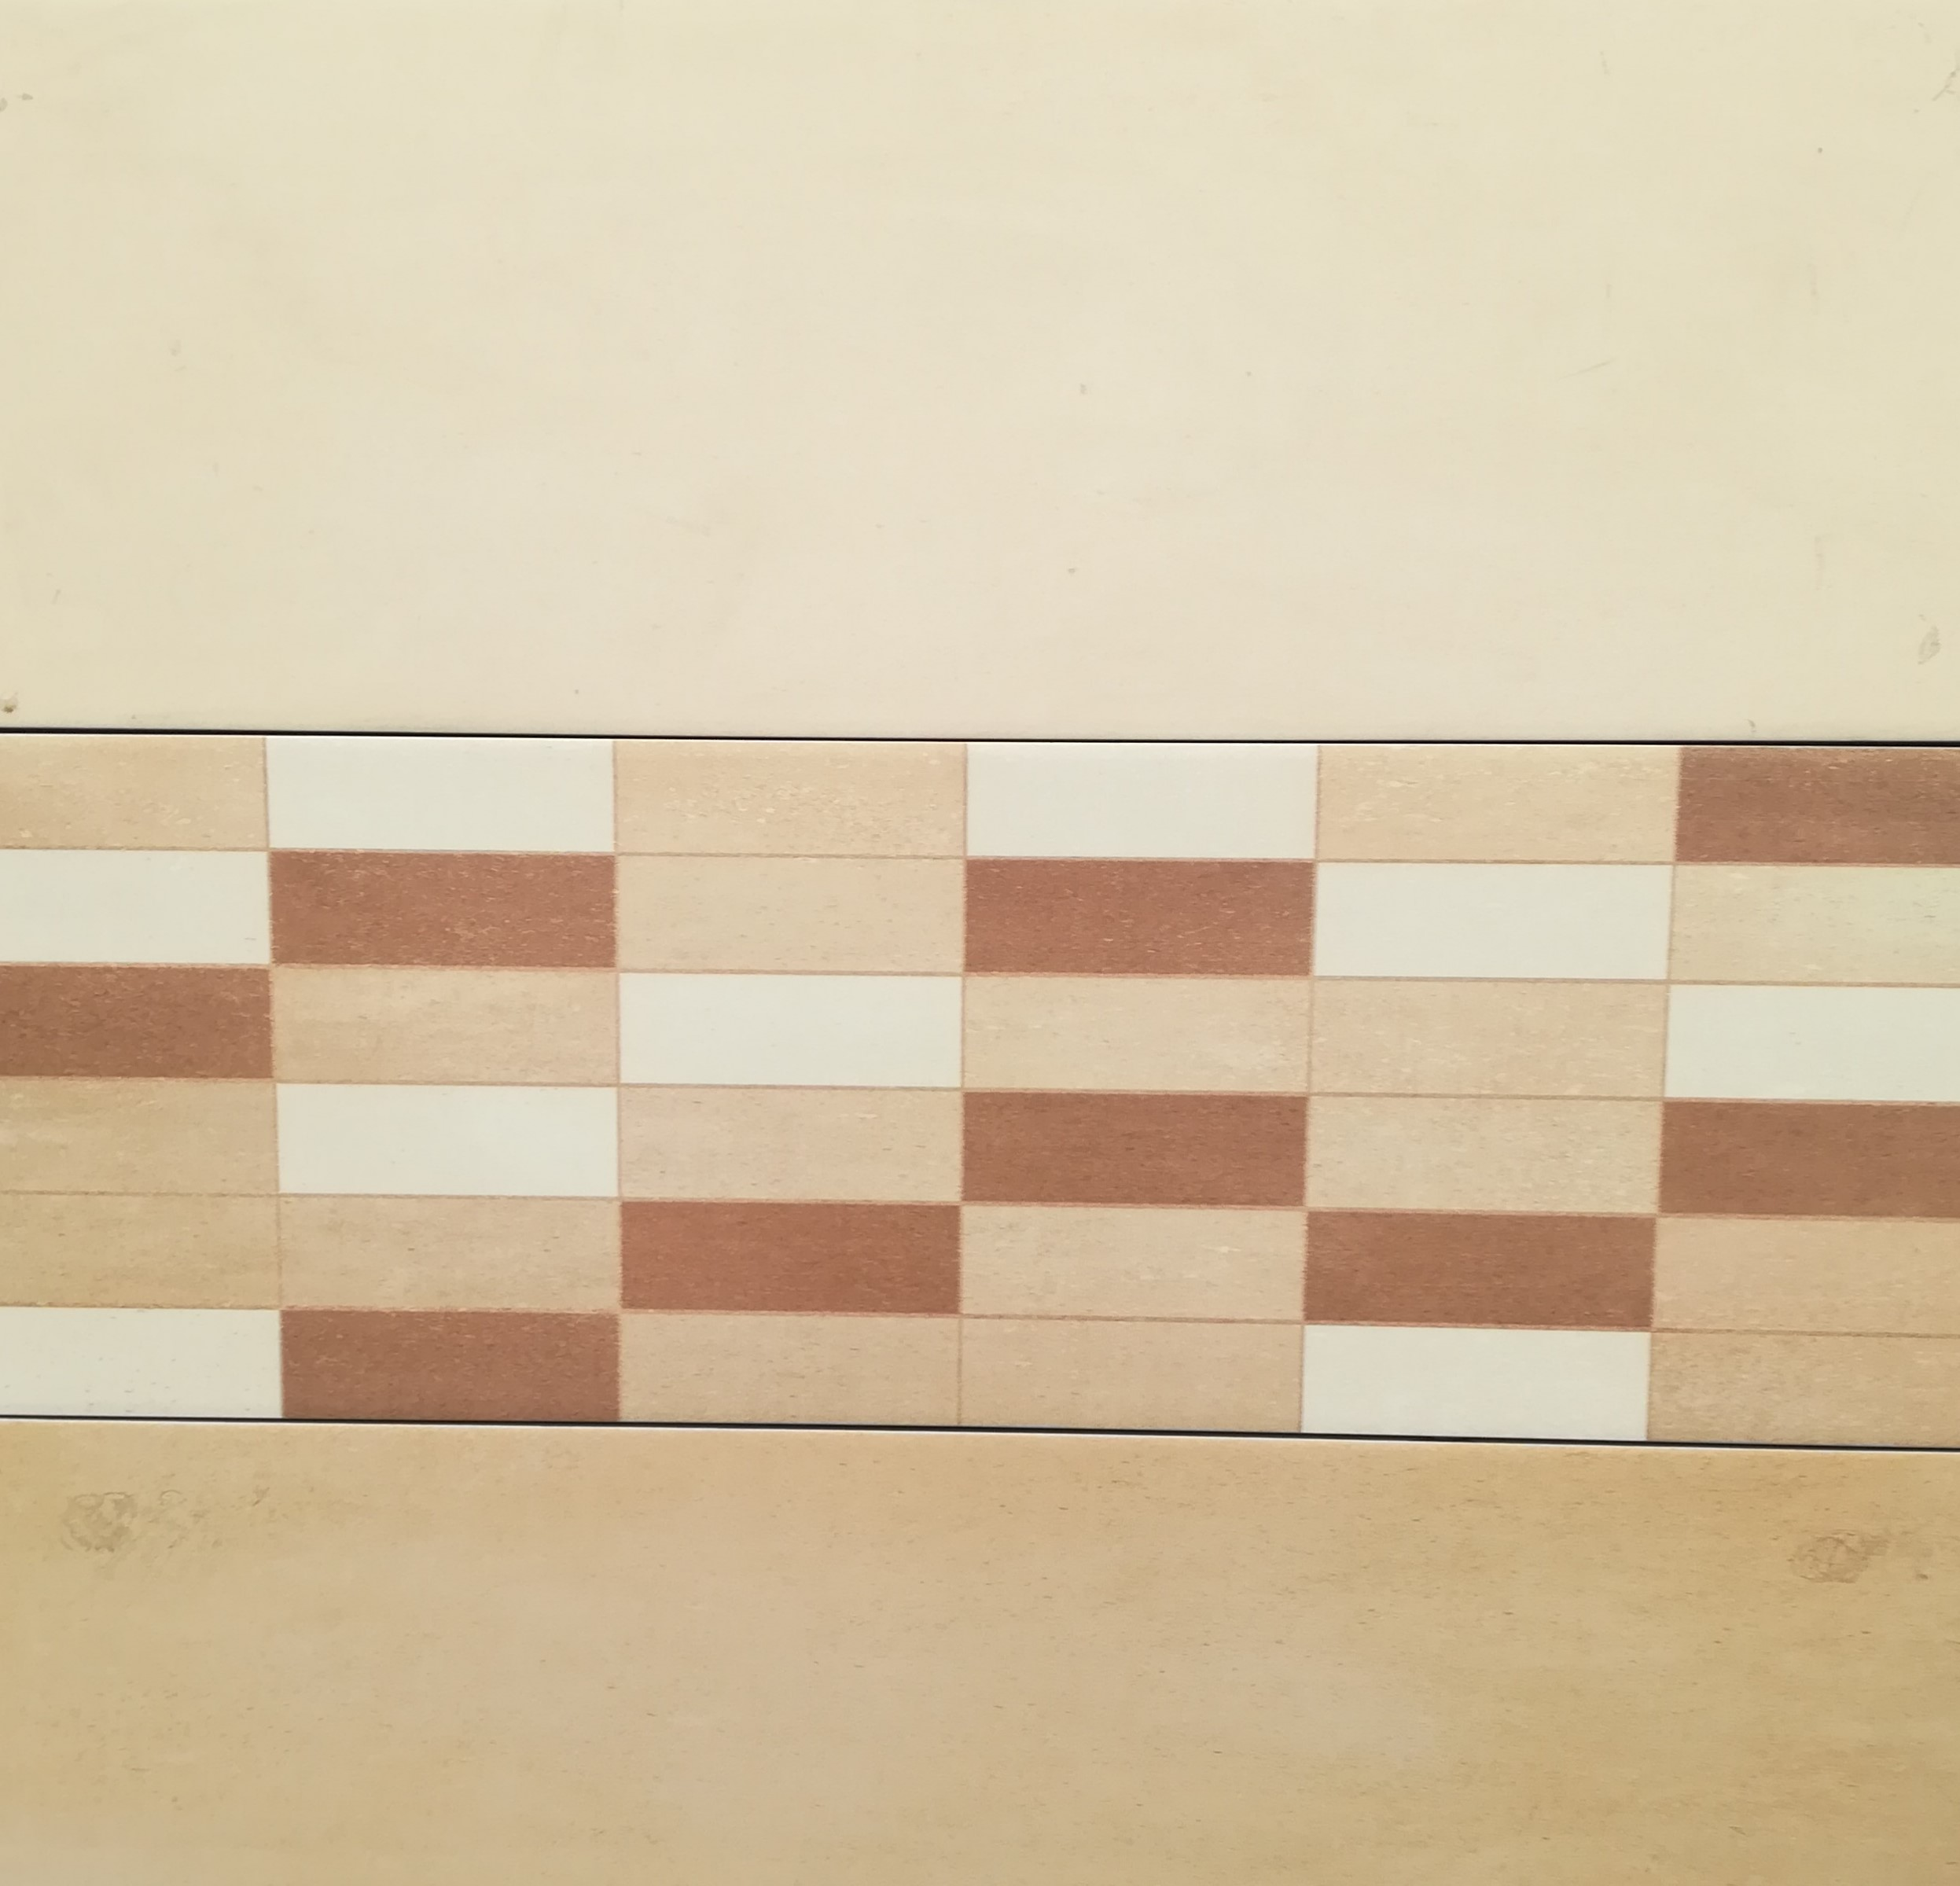 Luan Crema/luan brick beige/Luan beige